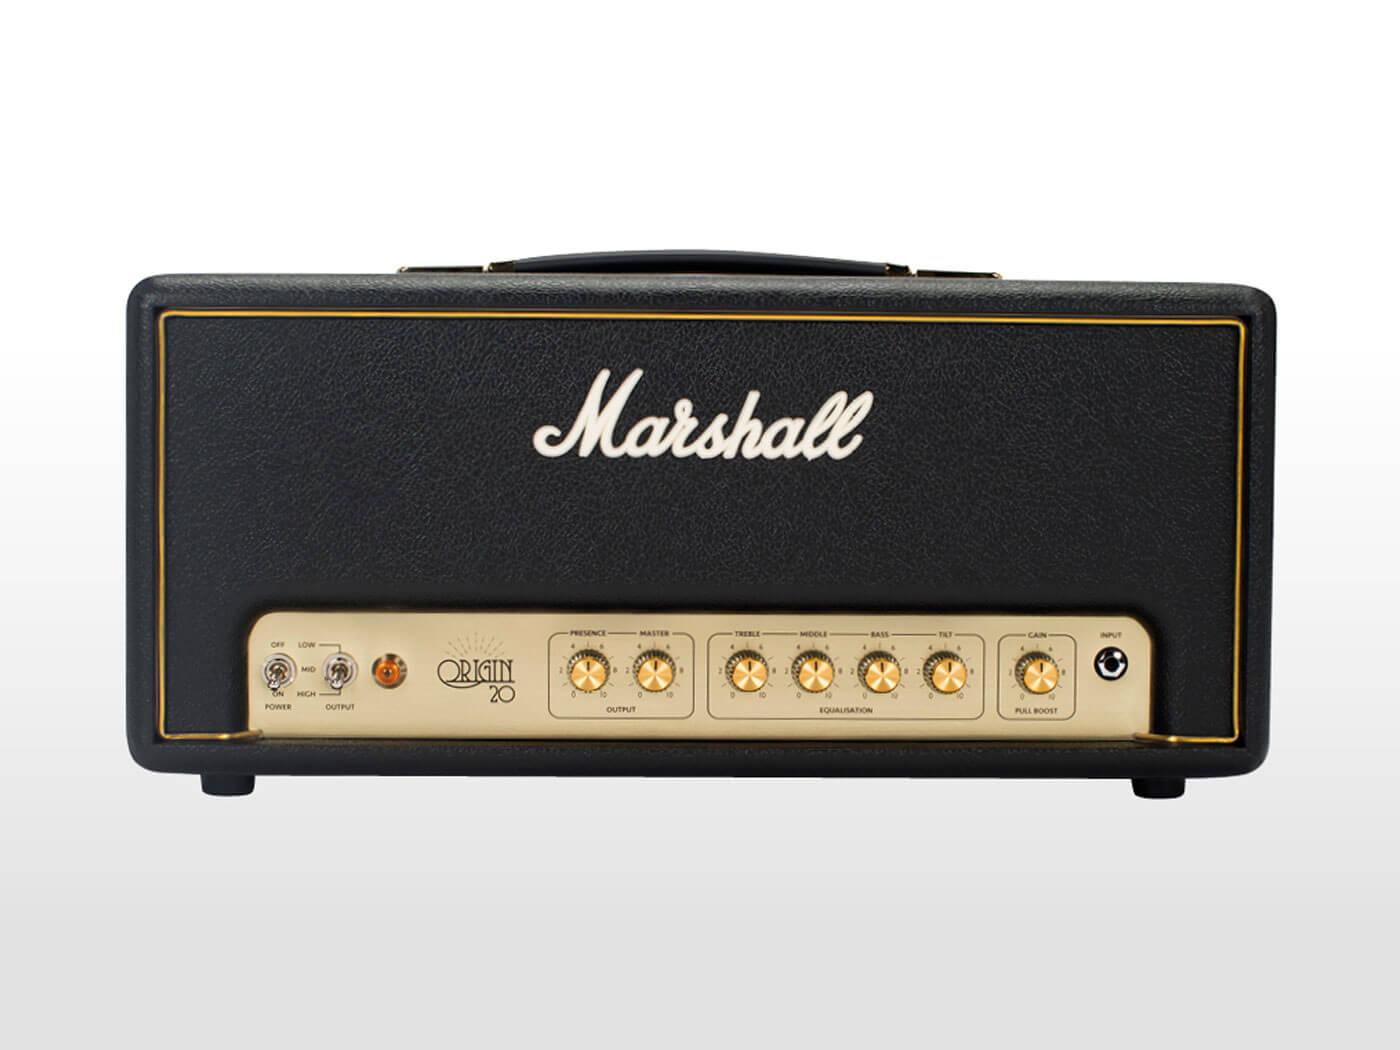 The Marshall Origin 20H